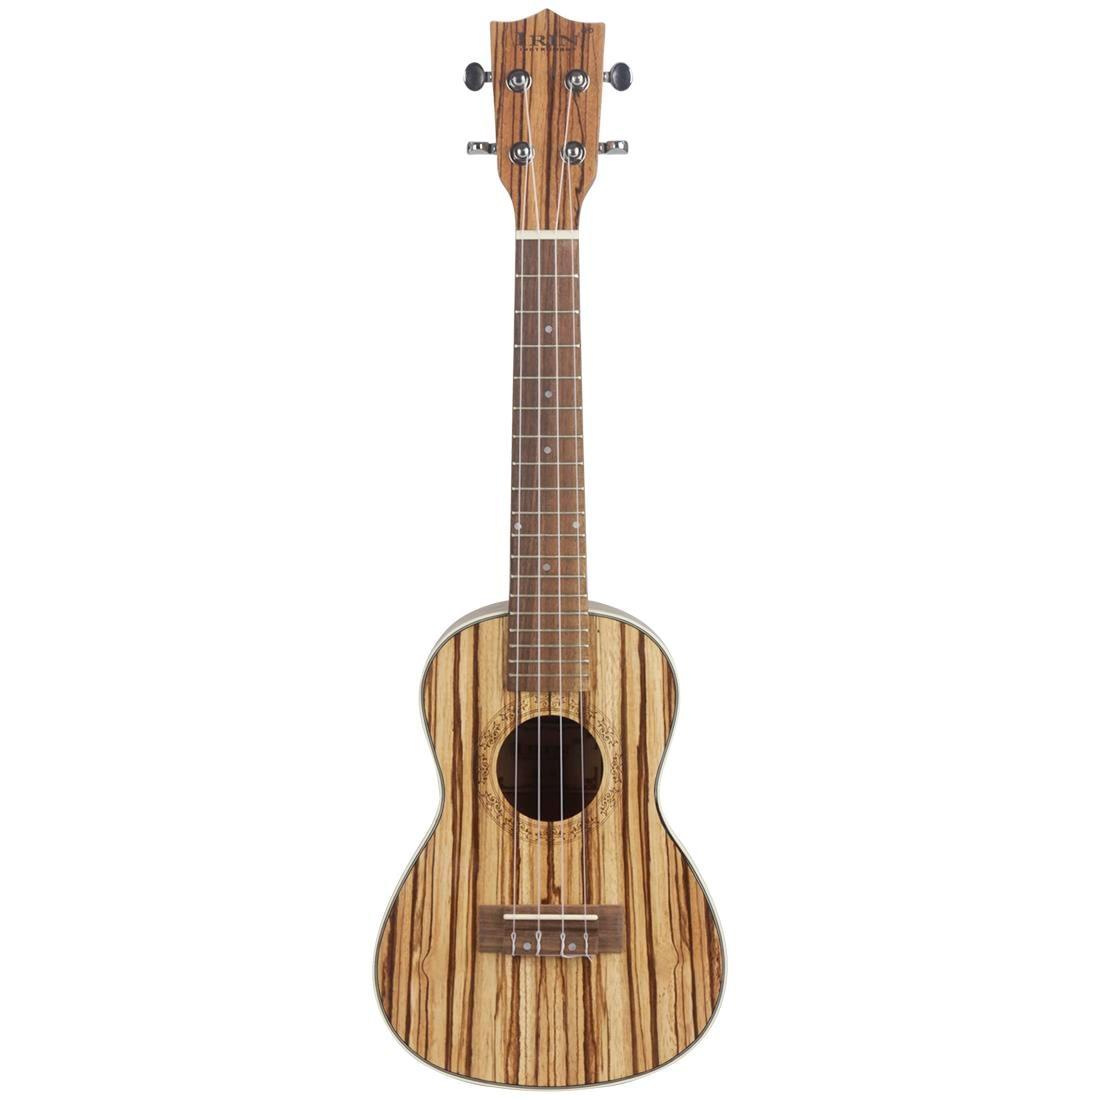 Xfdz irin concerto ukulele 24 Polegada 4 cordas hawaiian mini guitarra acústica ukelele guitarra enviar presentes cordas musicais ins